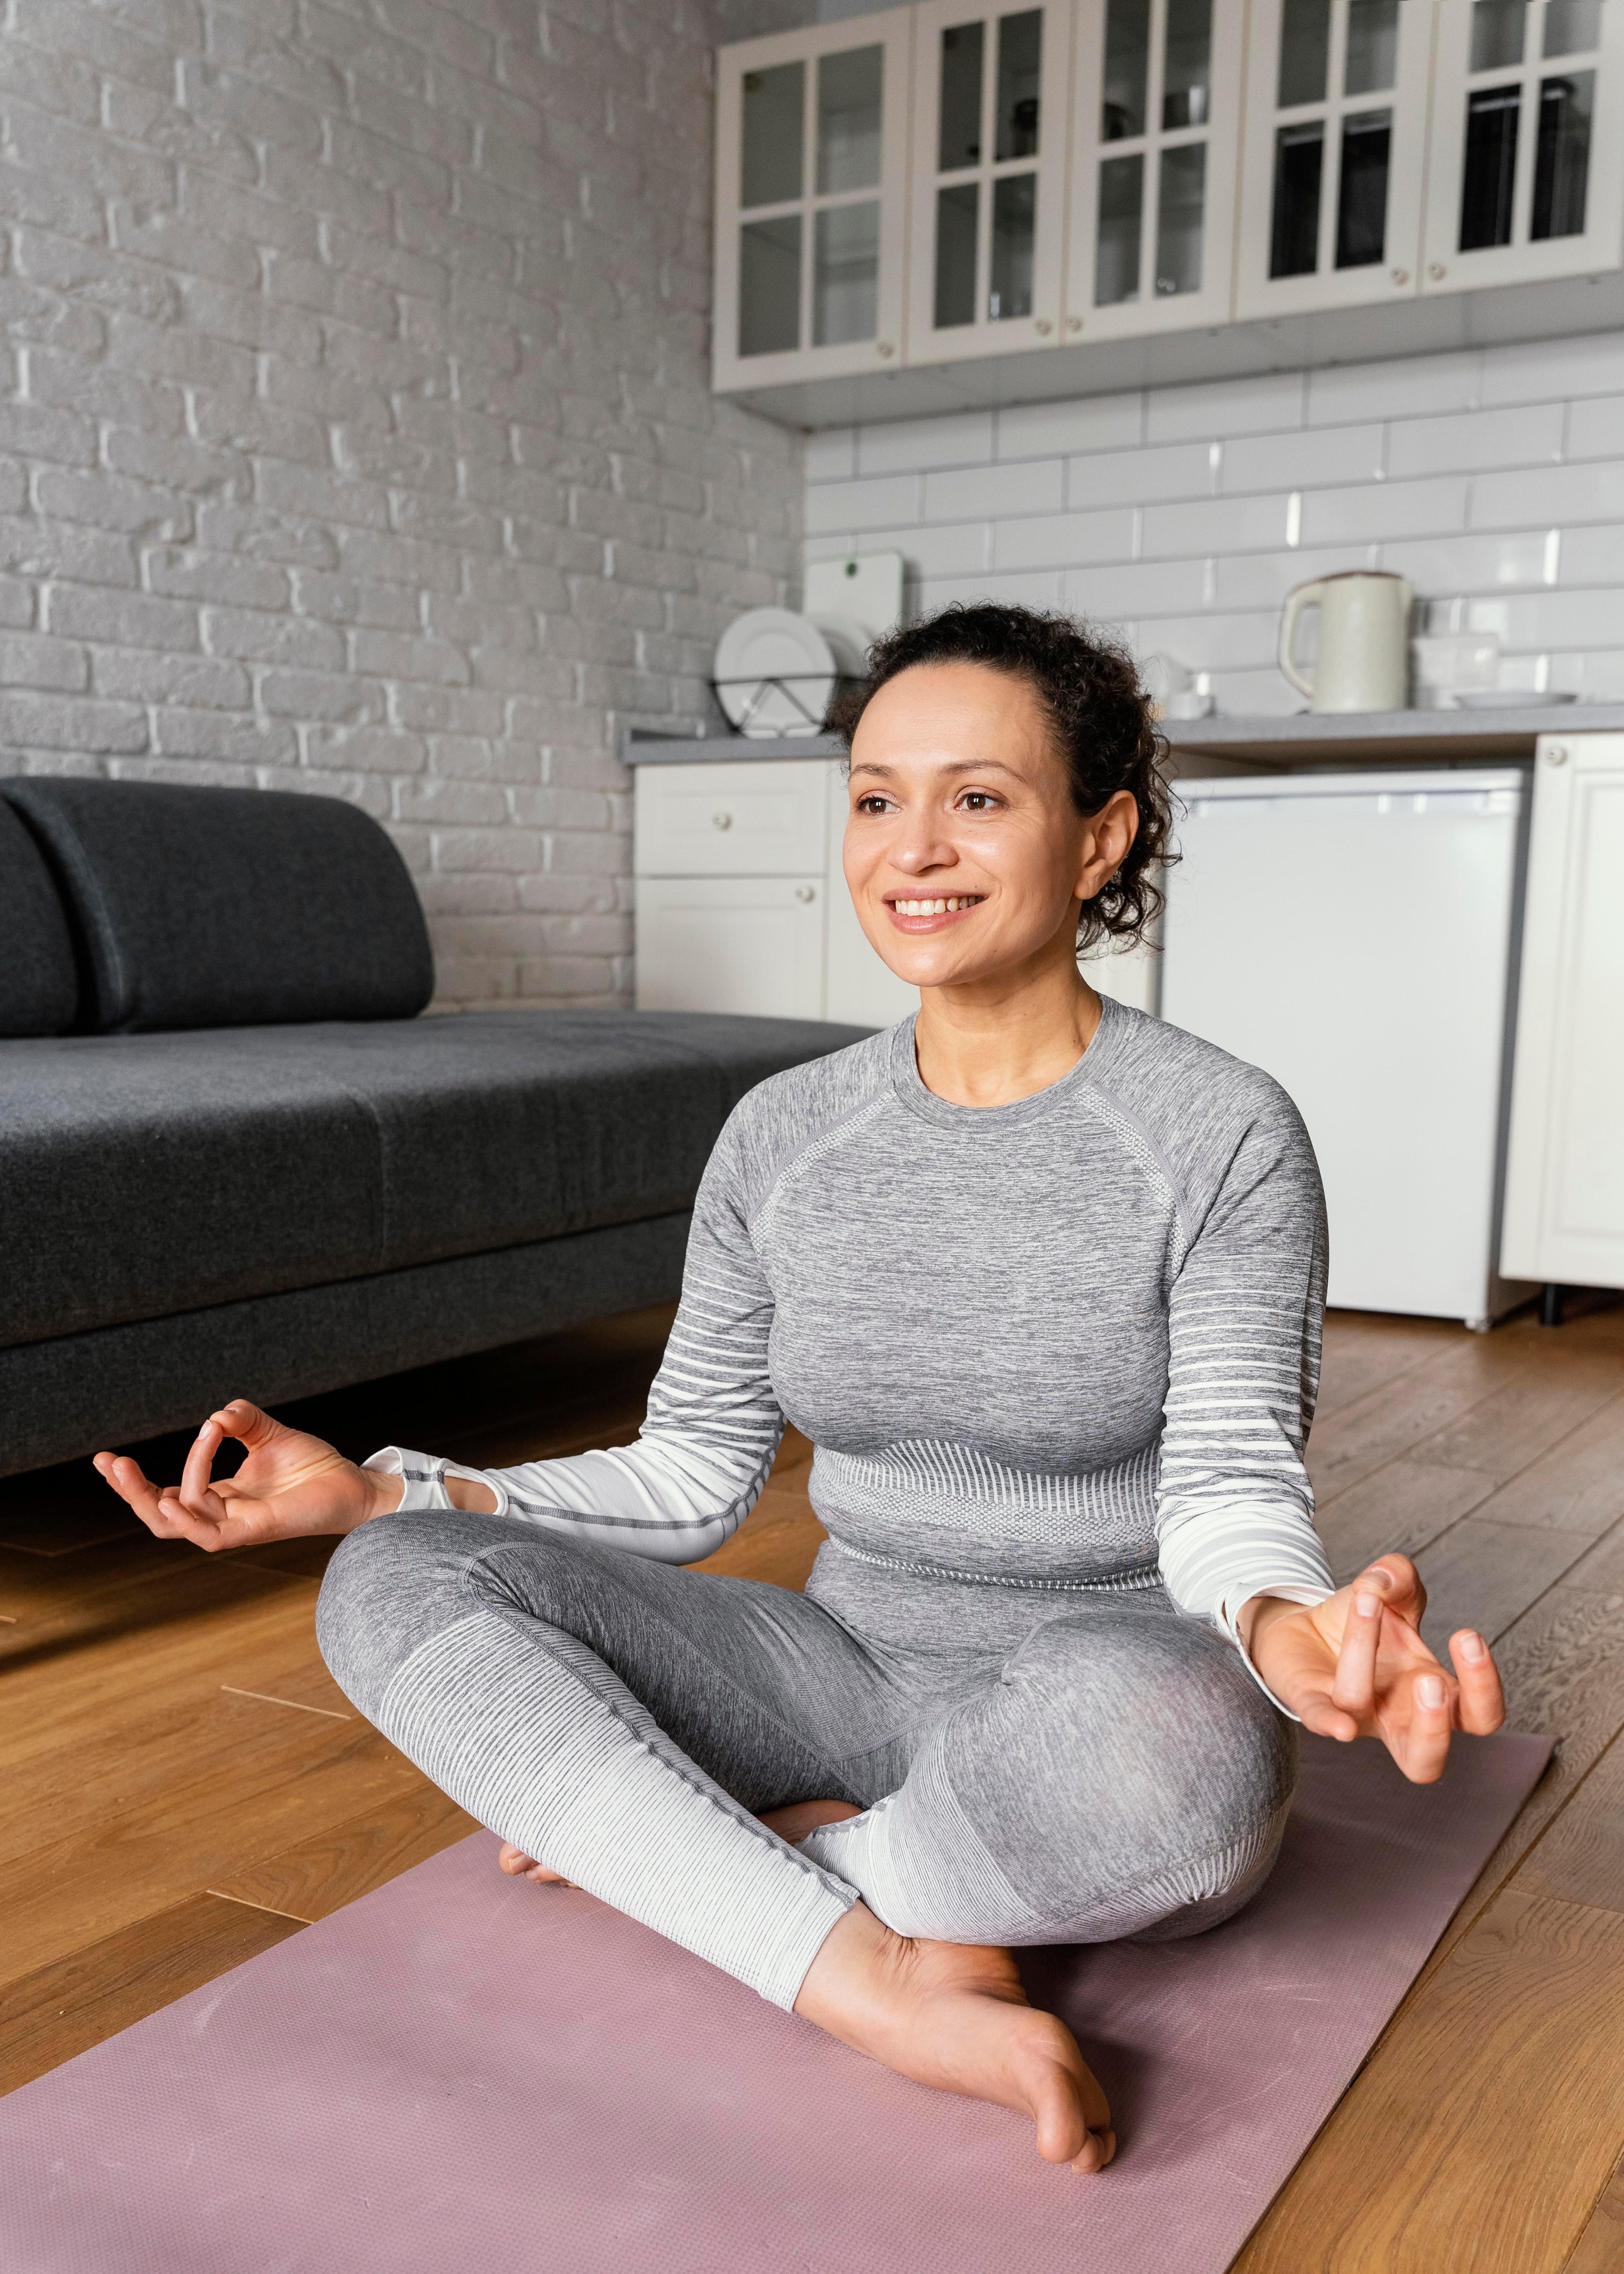 Curso de Mindfulness Online en Directo